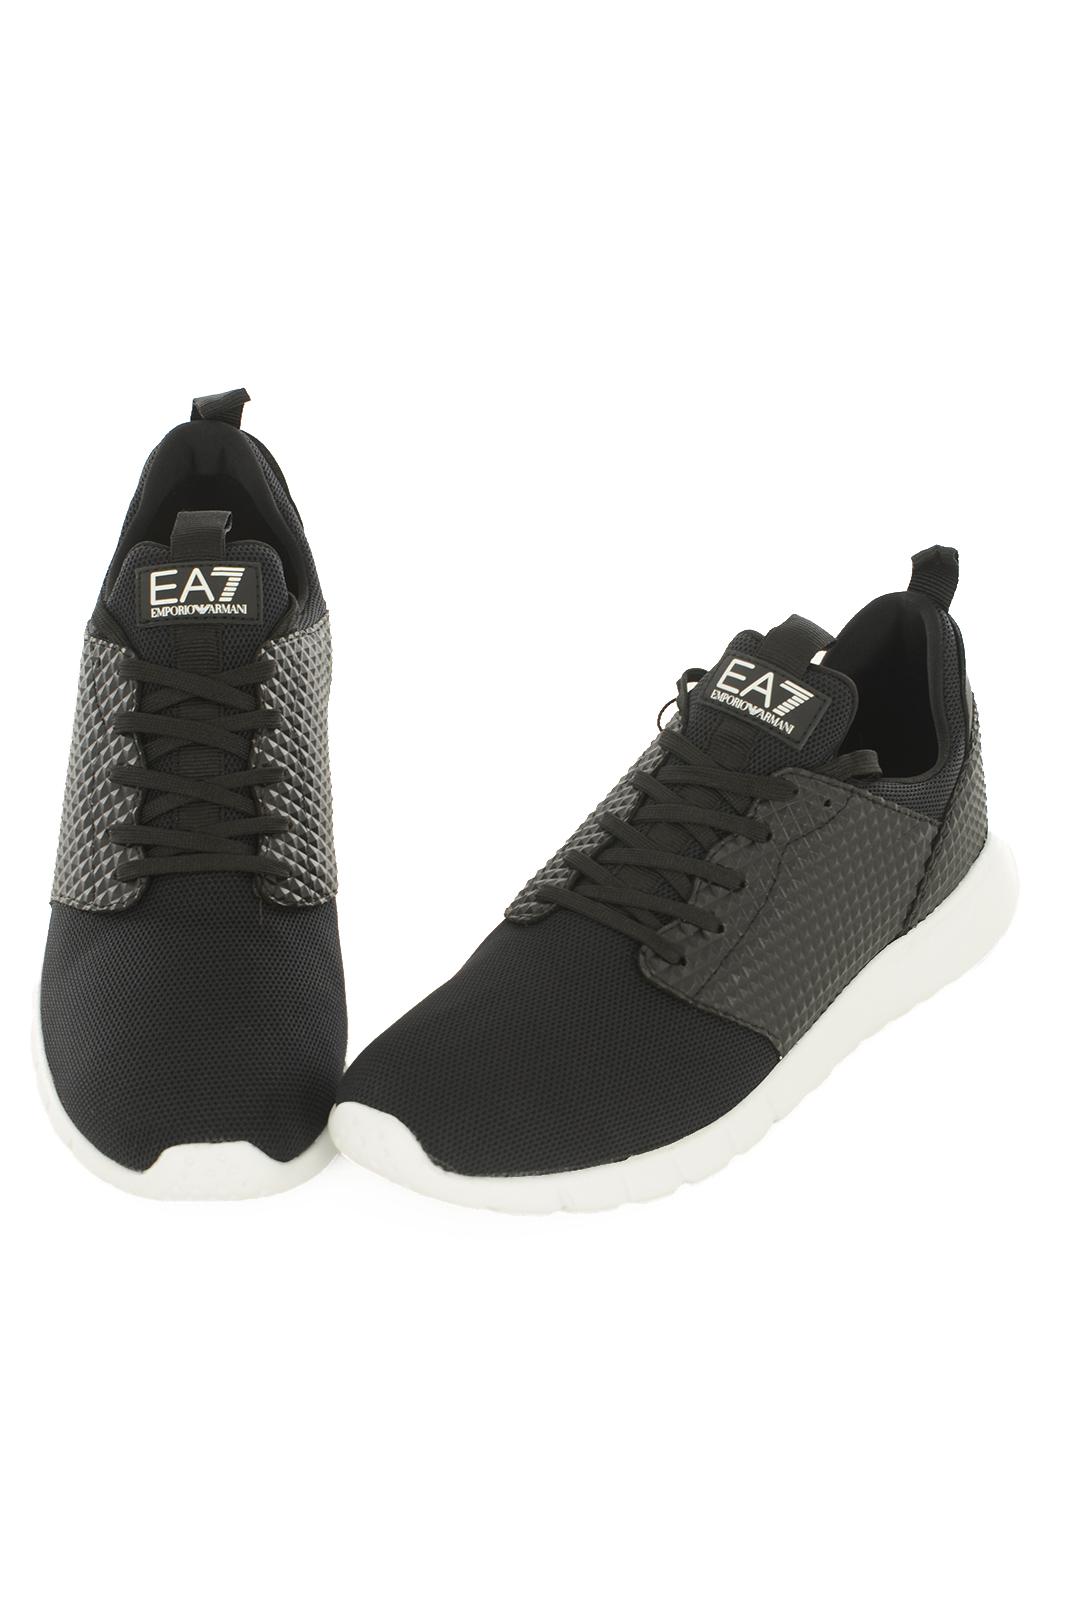 Chaussures   Emporio armani 248002 7A299 020 NOIR